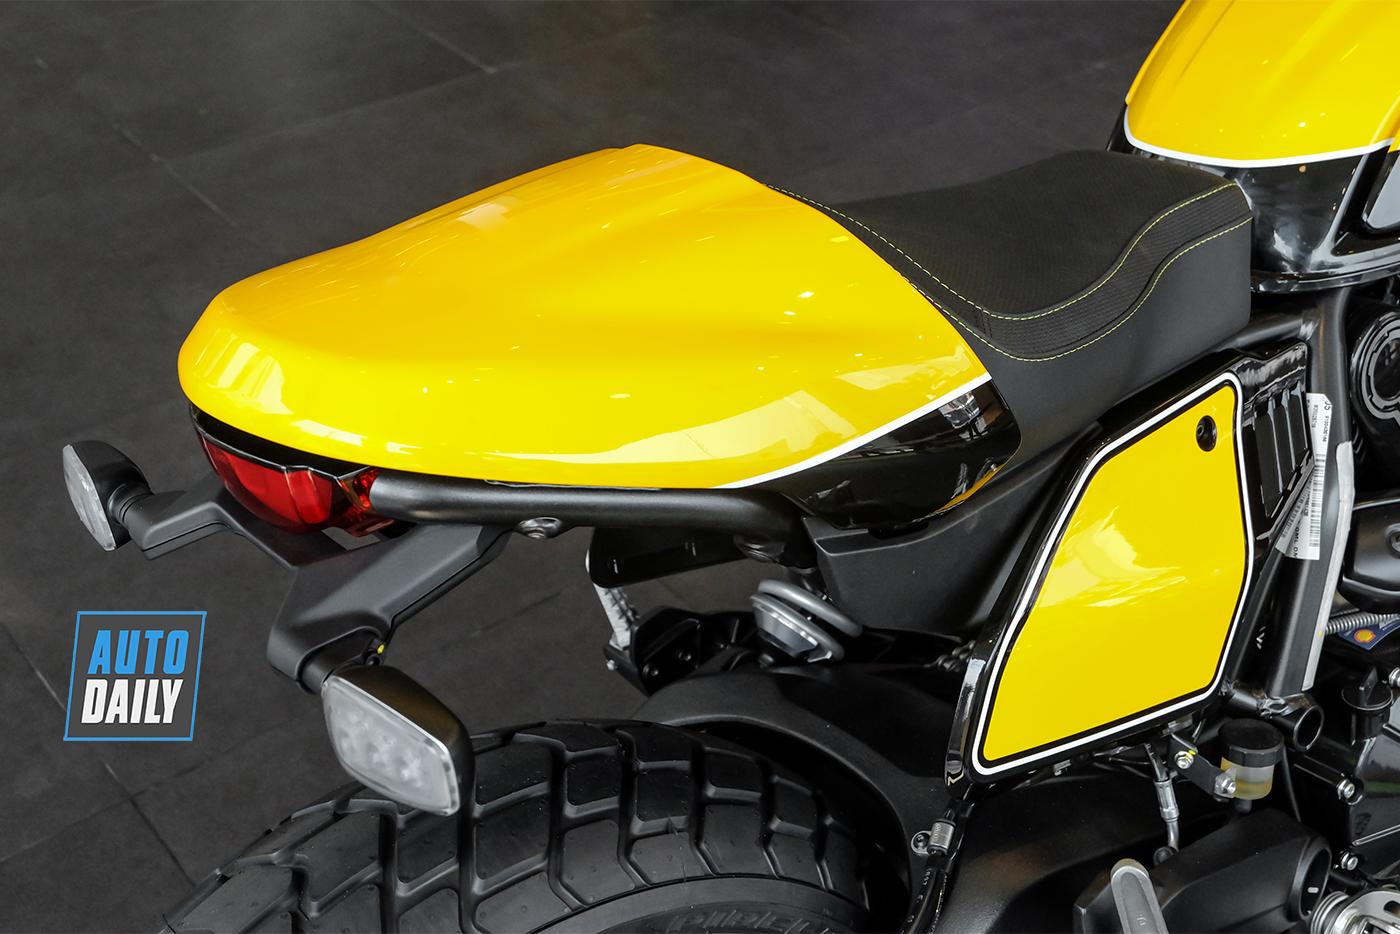 ducati-scrambler-full-throttle-2019-14.jpg